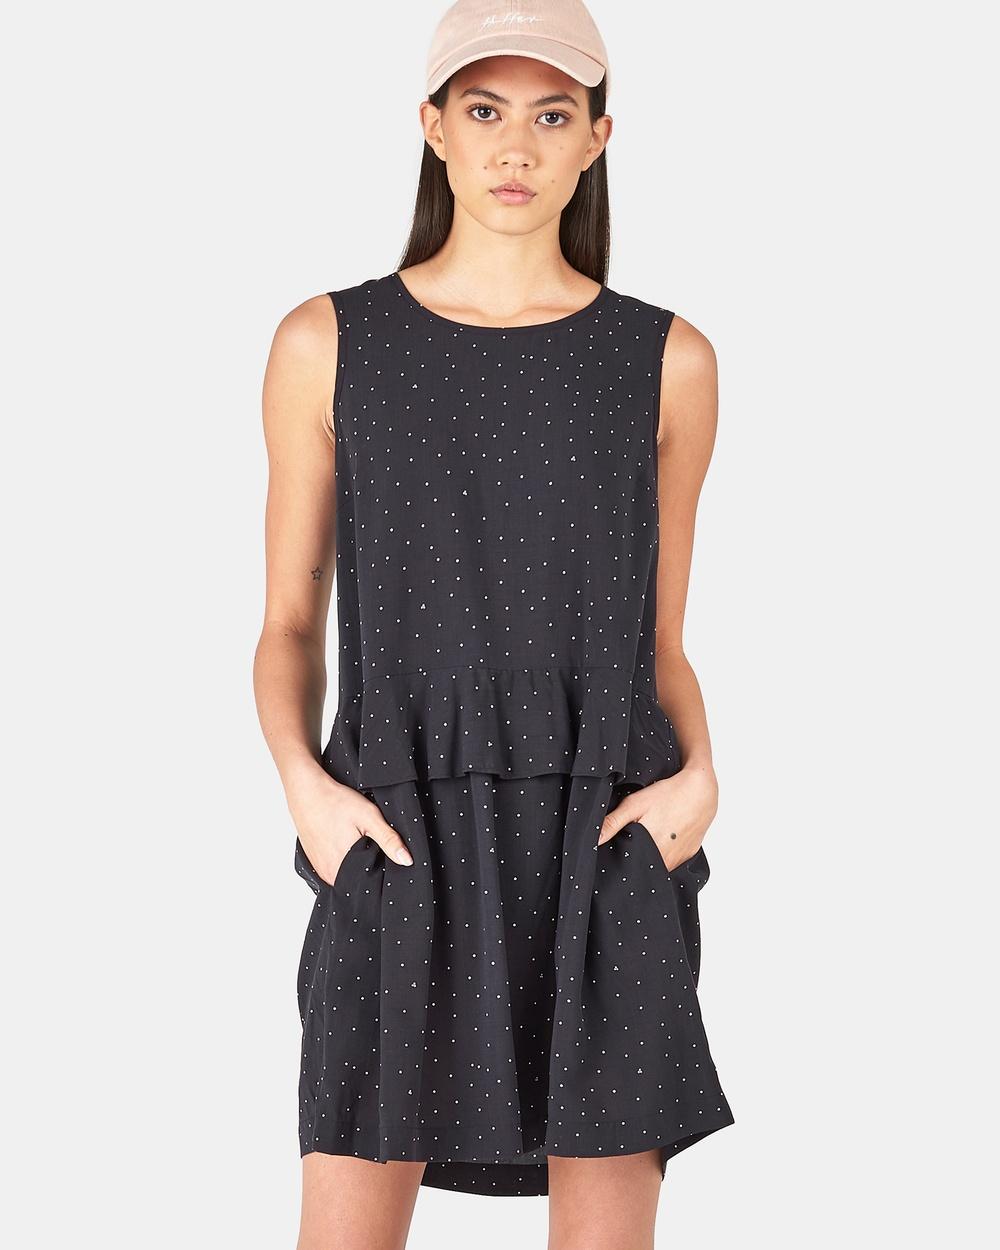 Huffer MONTY WAIST FRILL DRESS Dresses BLACK MONTY WAIST FRILL DRESS